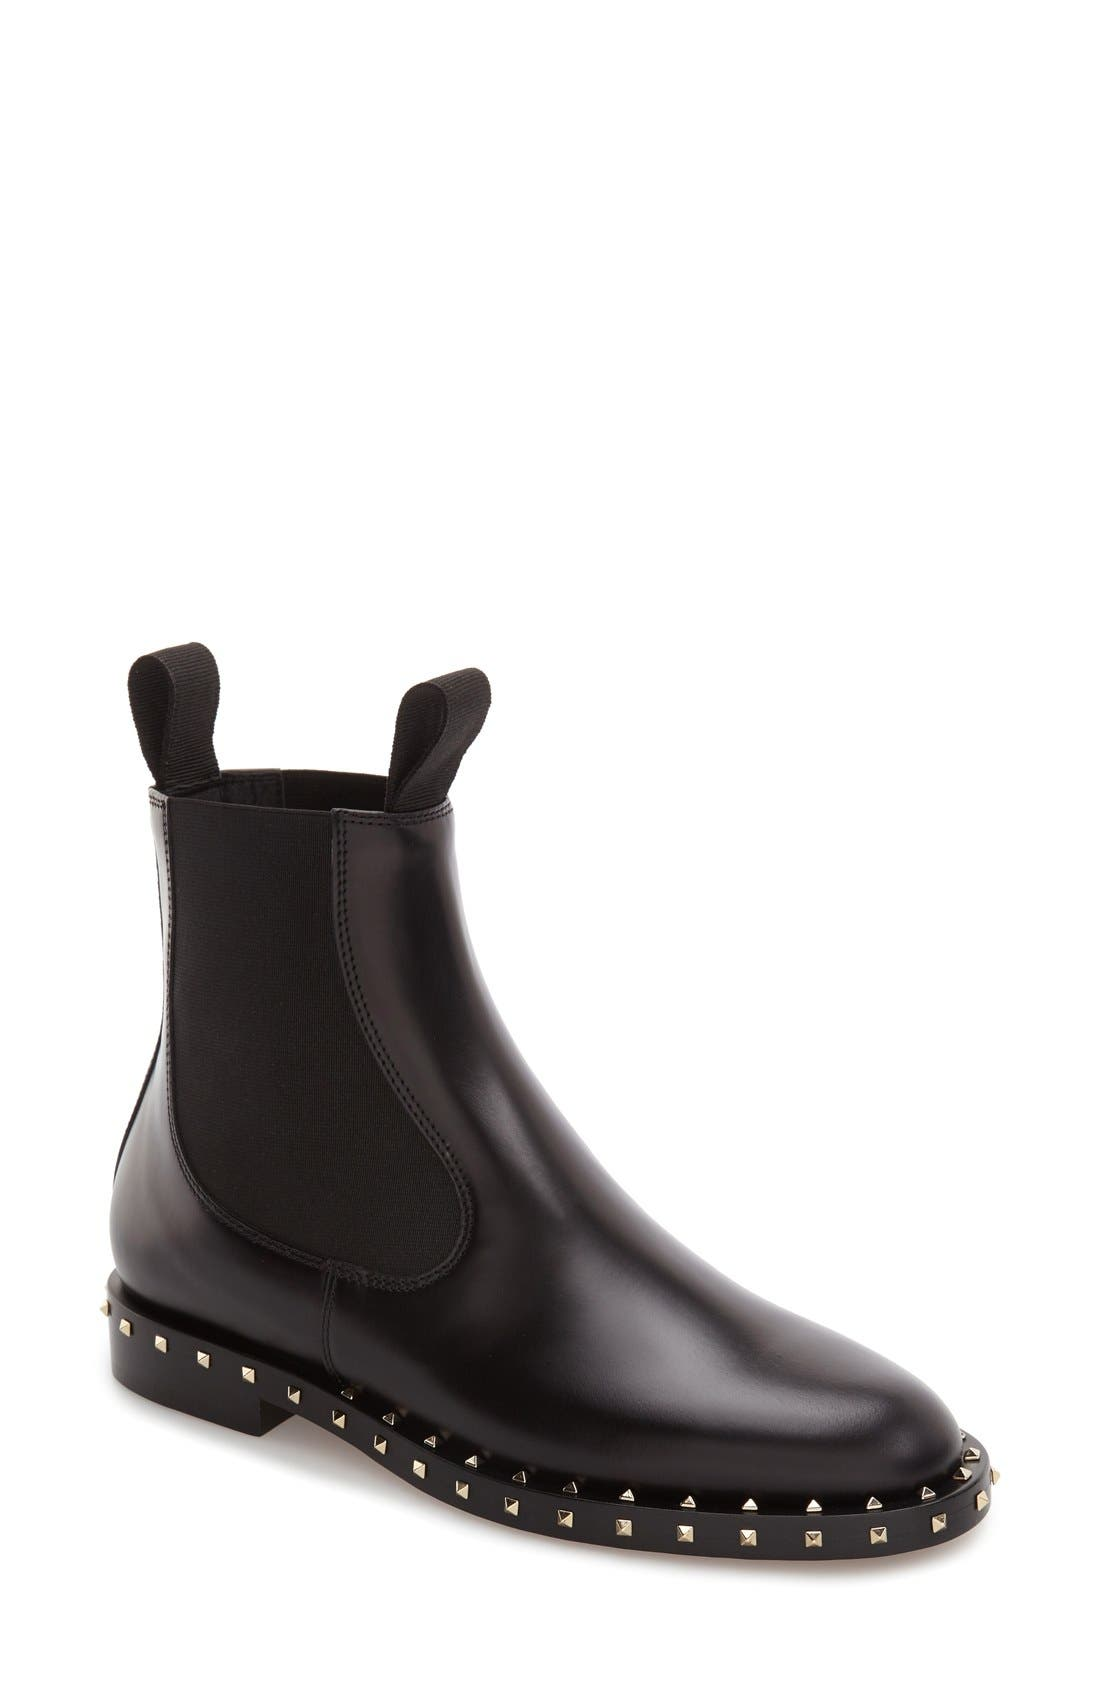 VALENTINO GARAVANI Rockstud Chelsea Boot (Women)